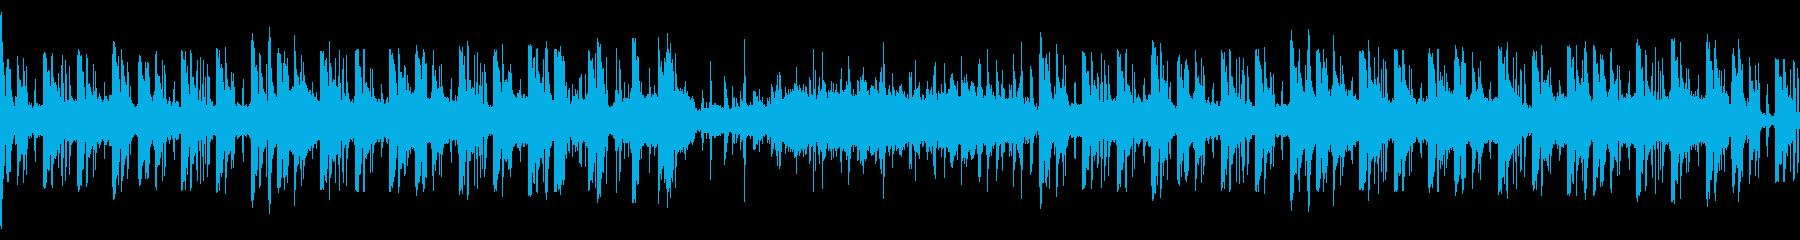 LOOP Battle Game DnBの再生済みの波形